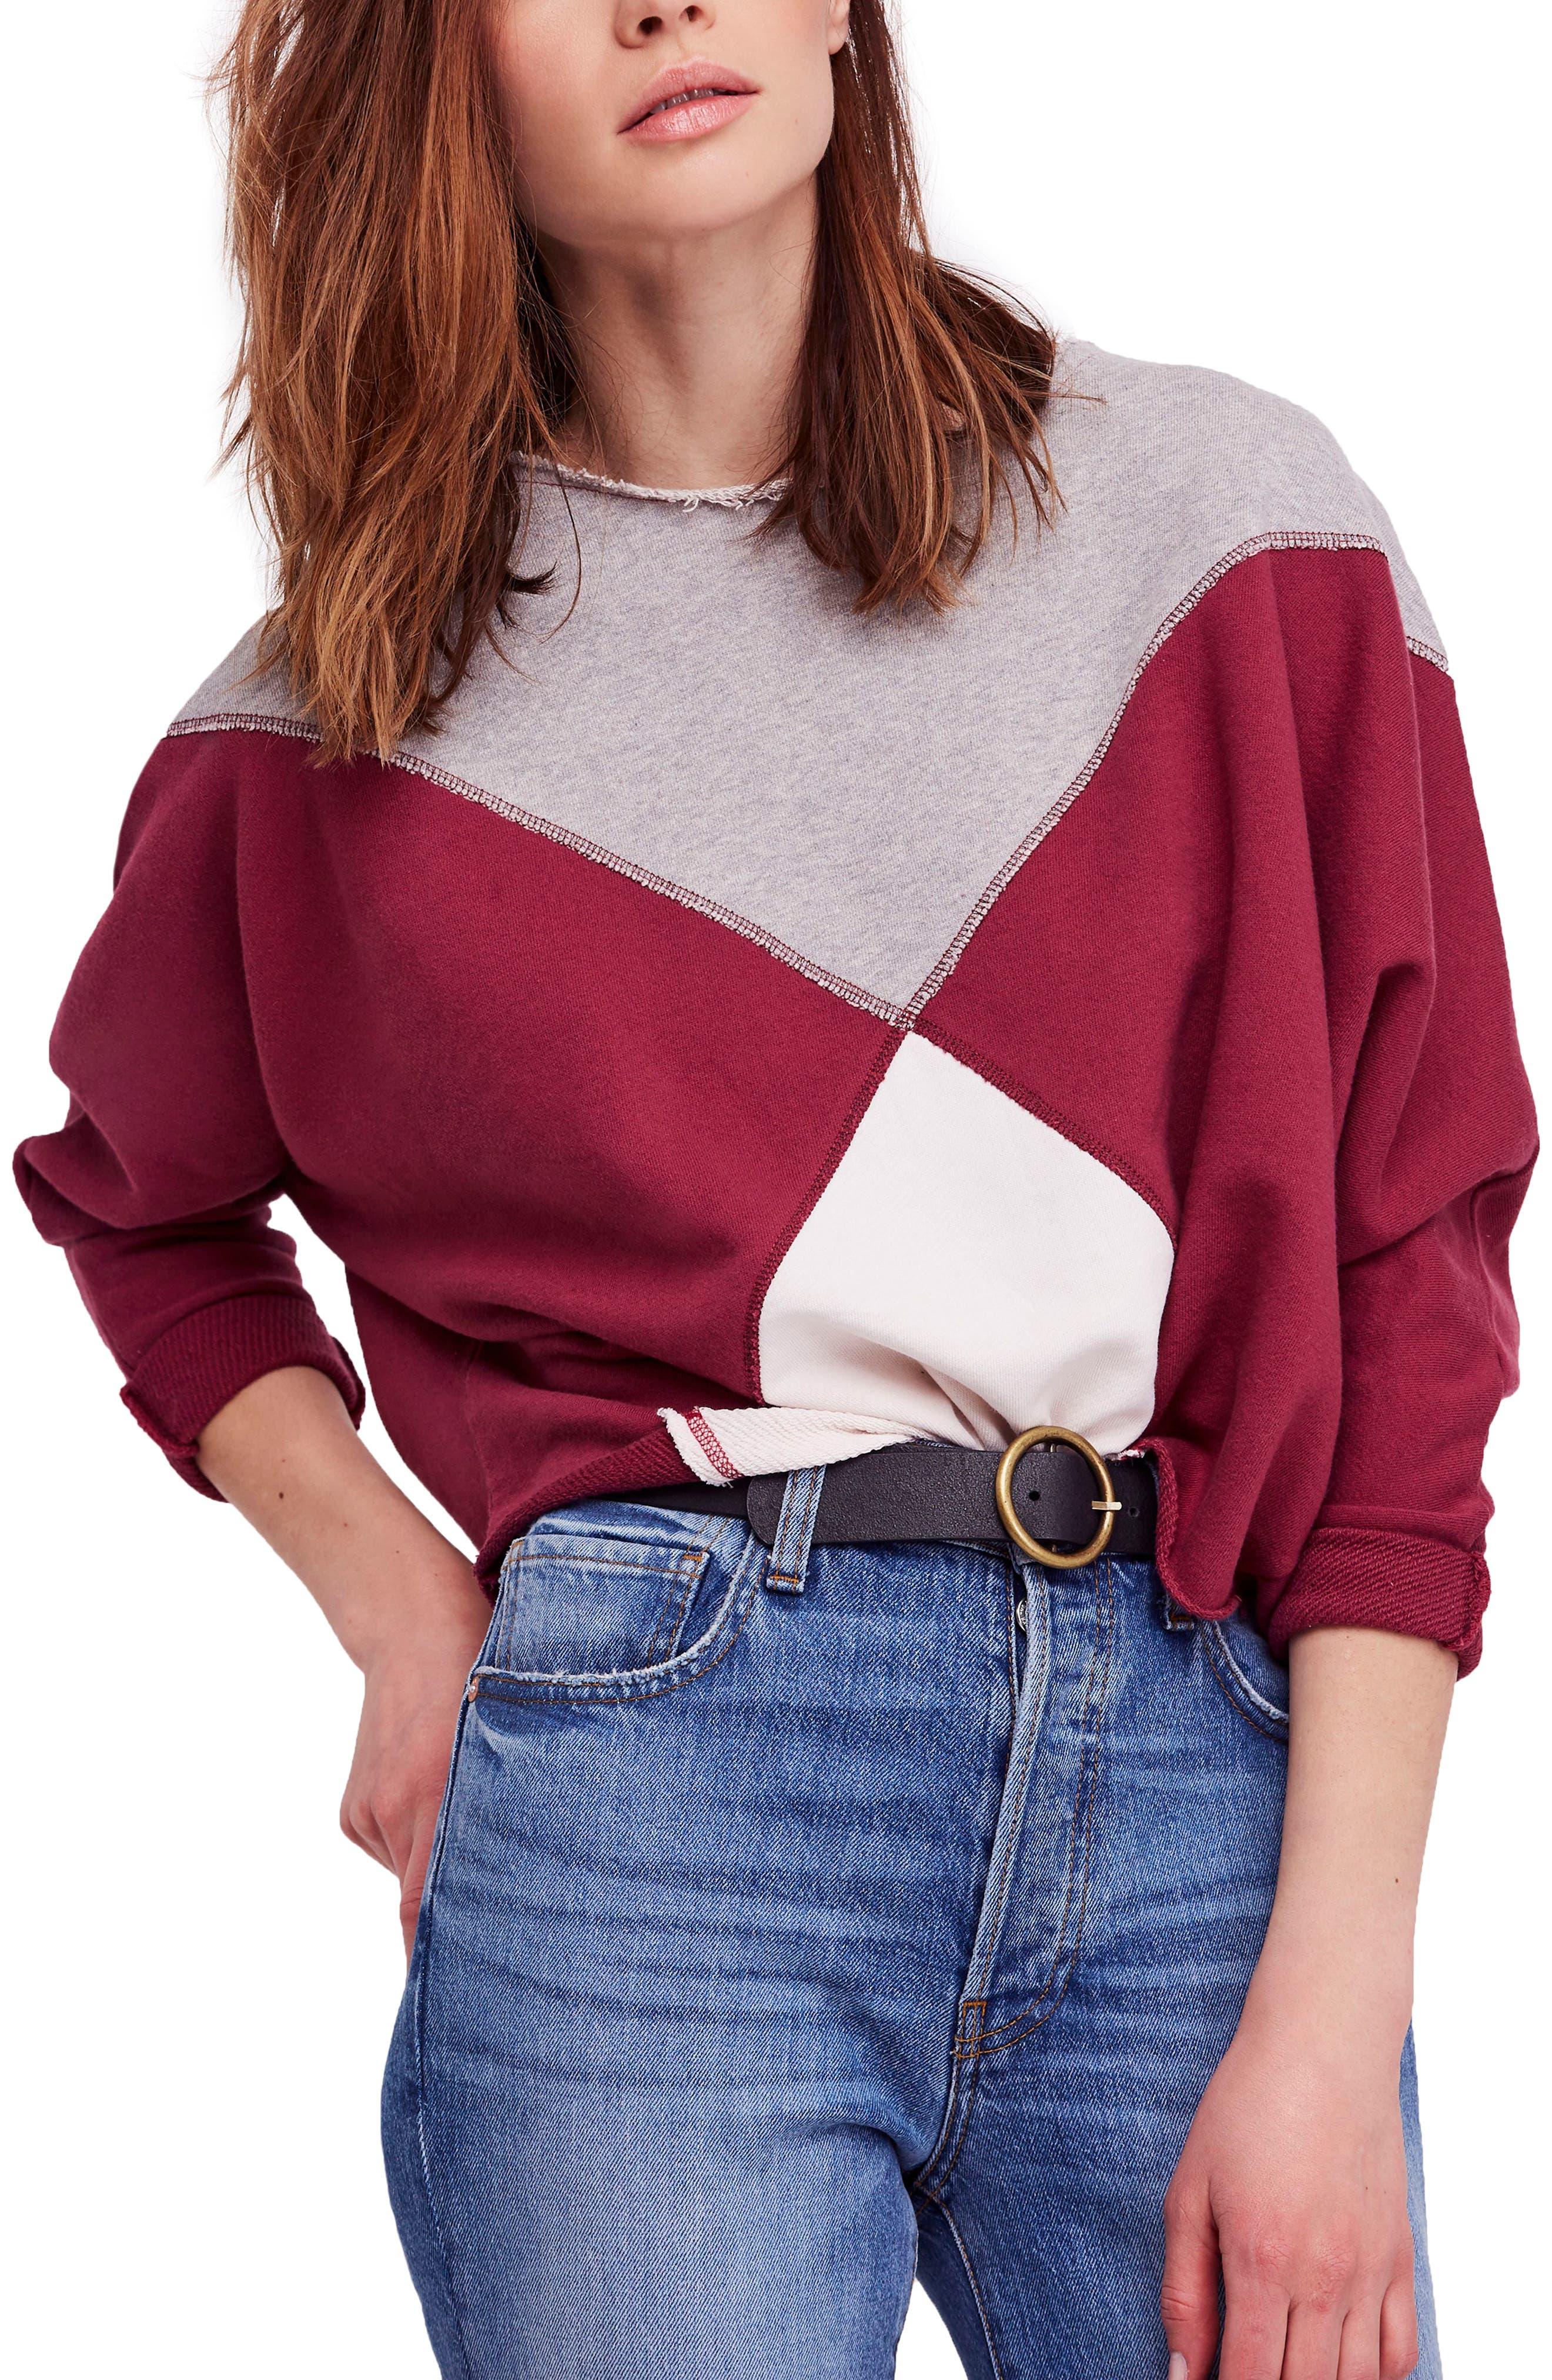 Montauk Sweatshirt,                             Main thumbnail 1, color,                             PINK